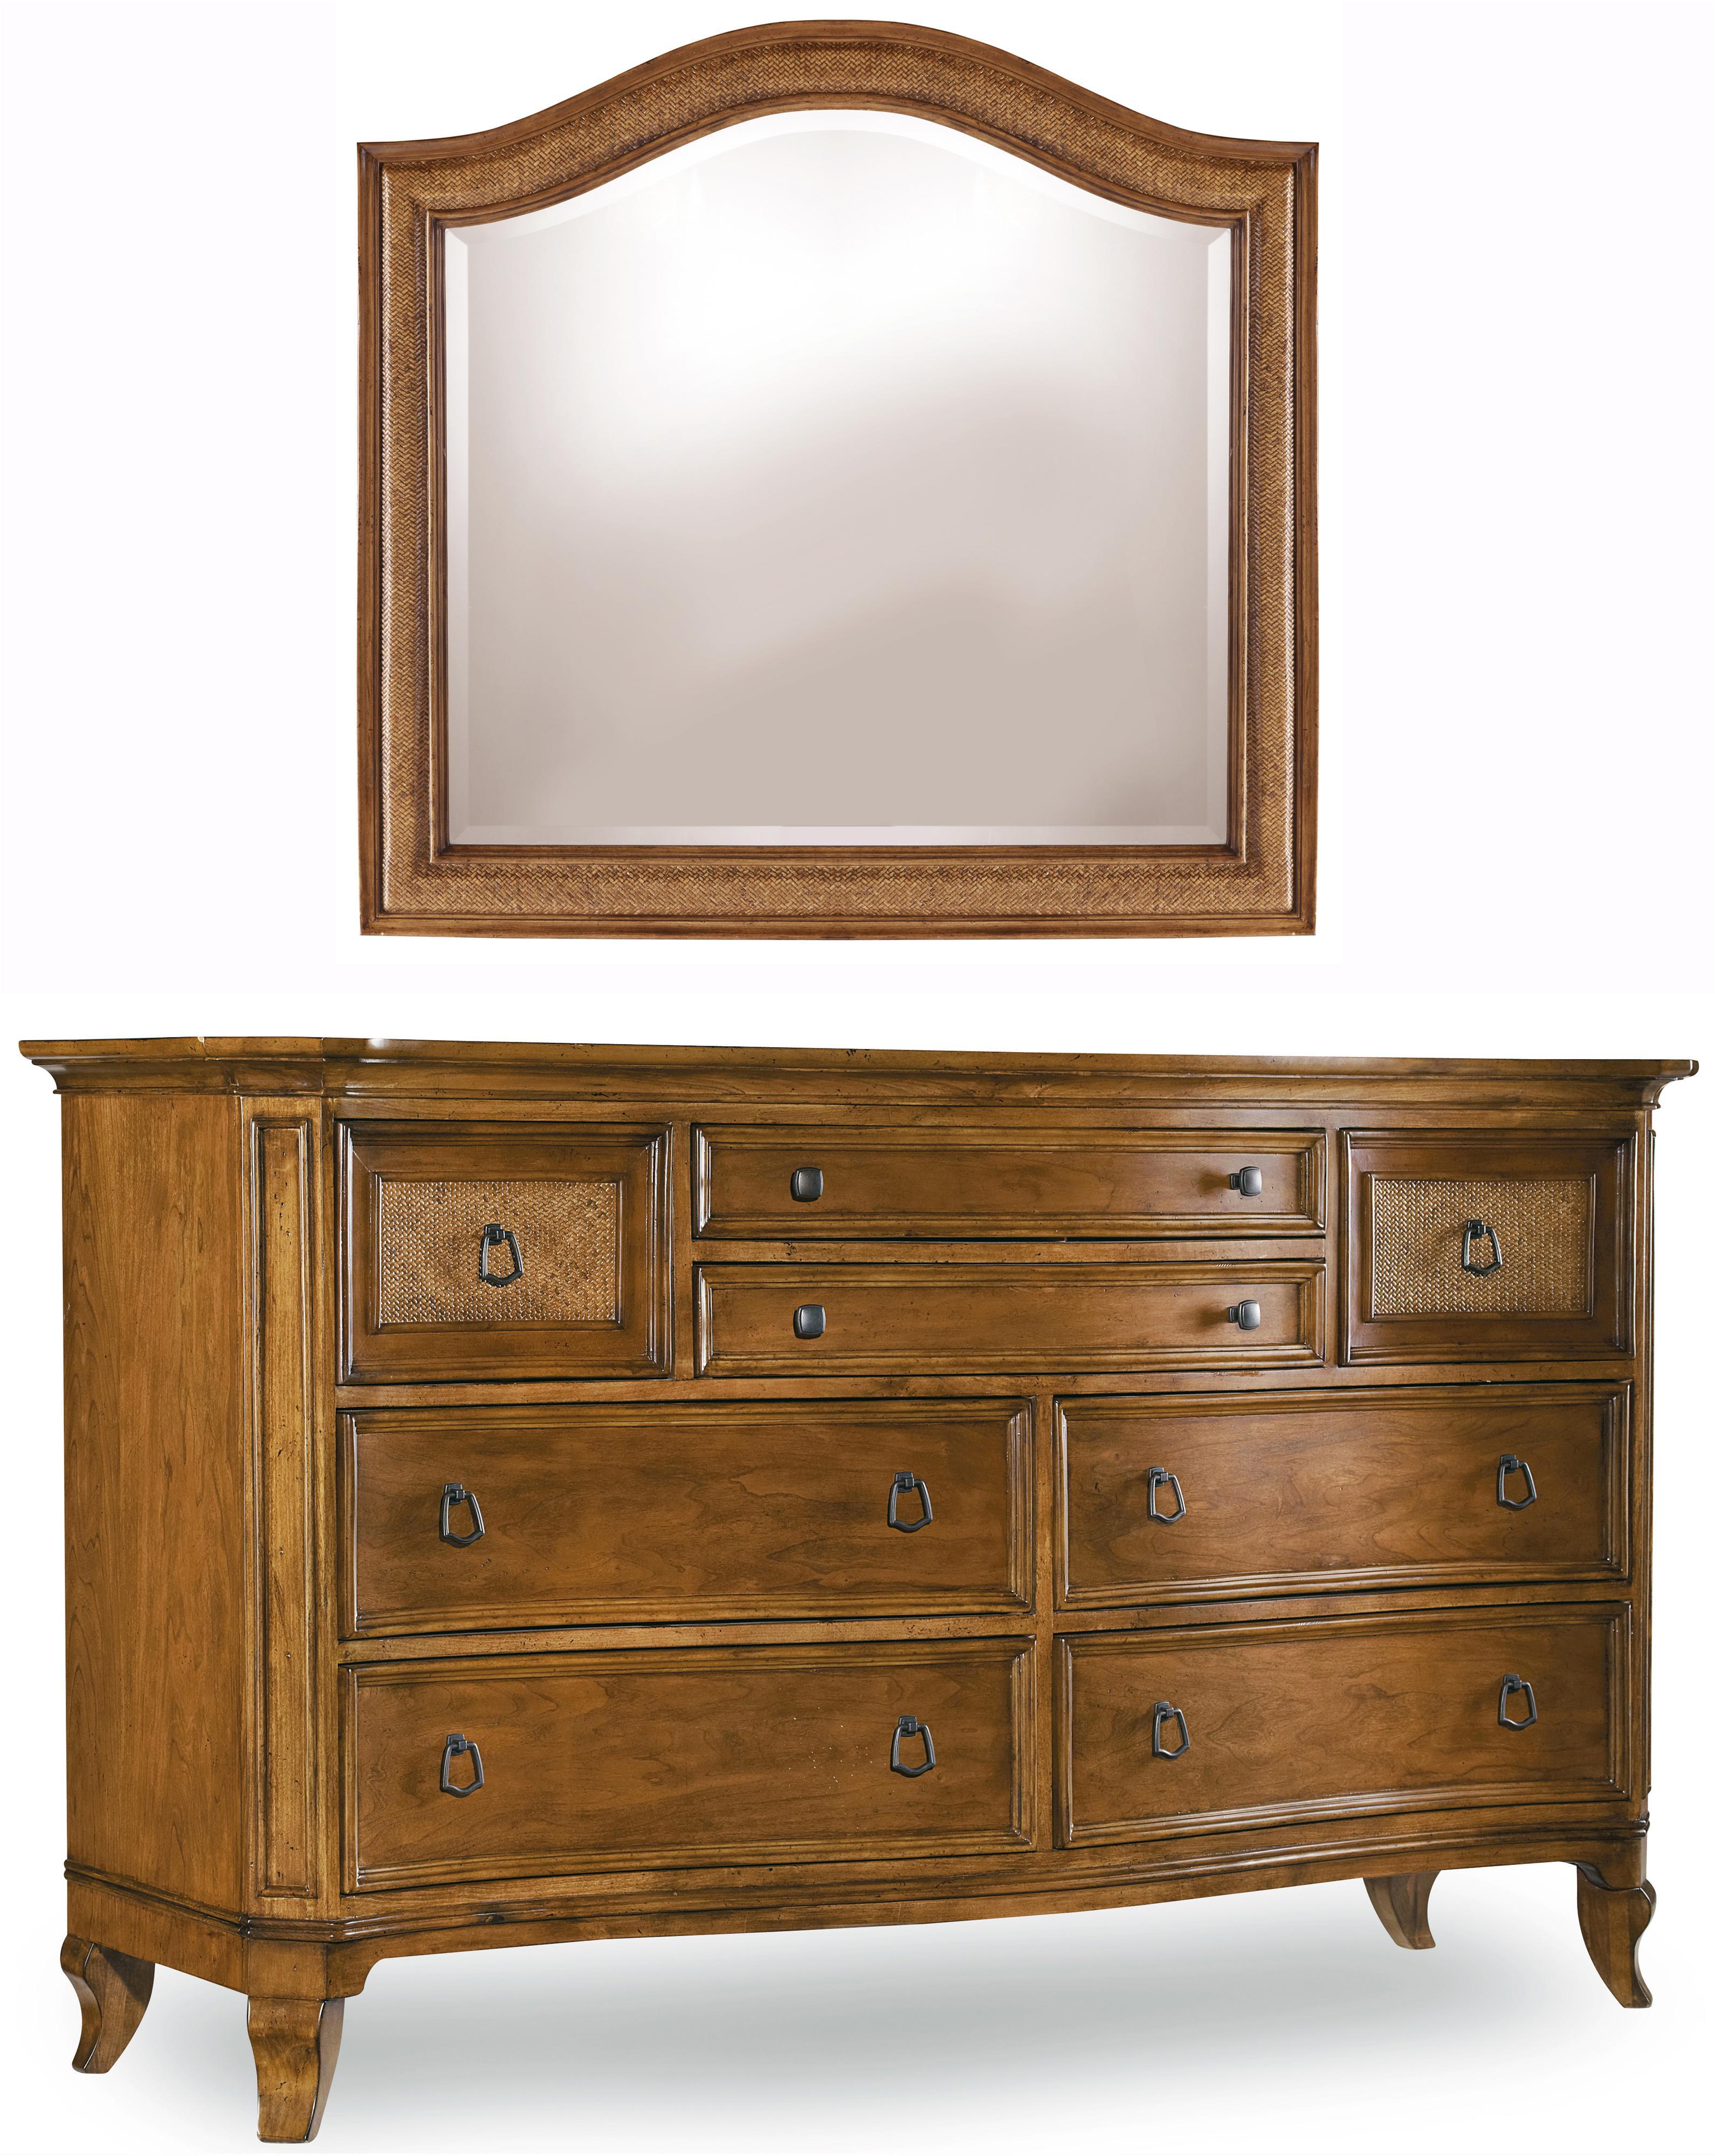 Hooker Furniture Windward Dresser & Mirror Combination - Item Number: 1125-91002+91009